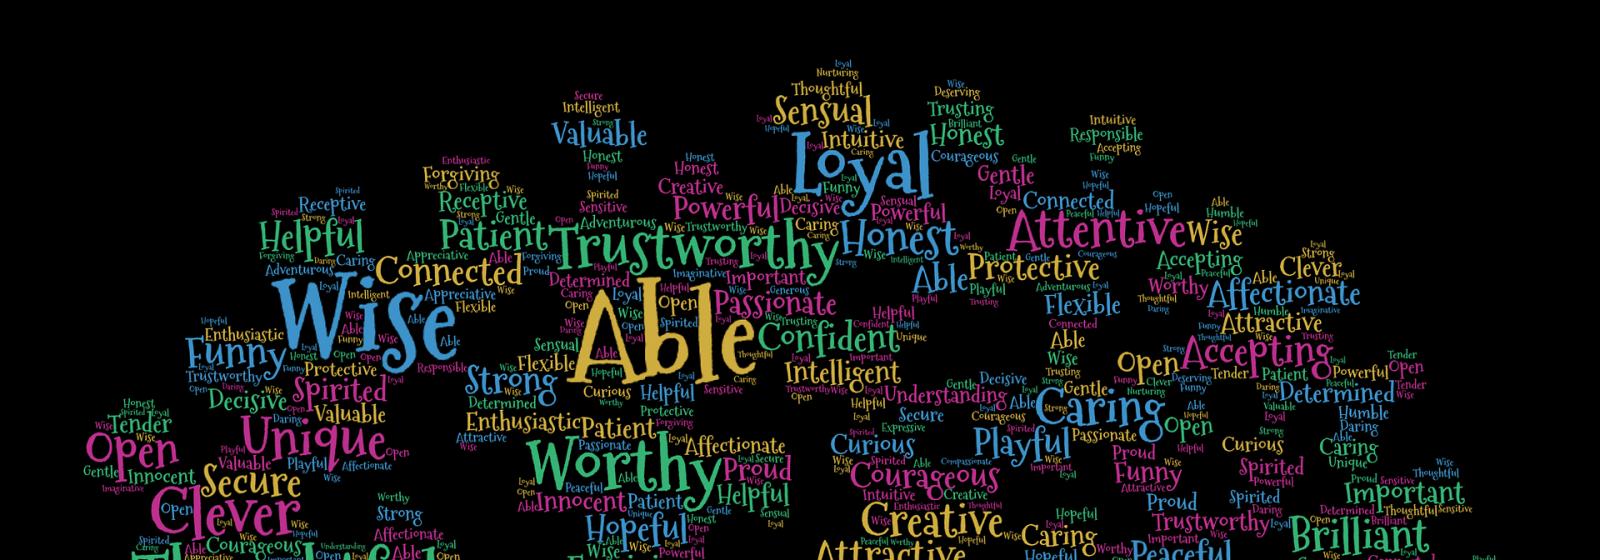 Student Leader Qualities